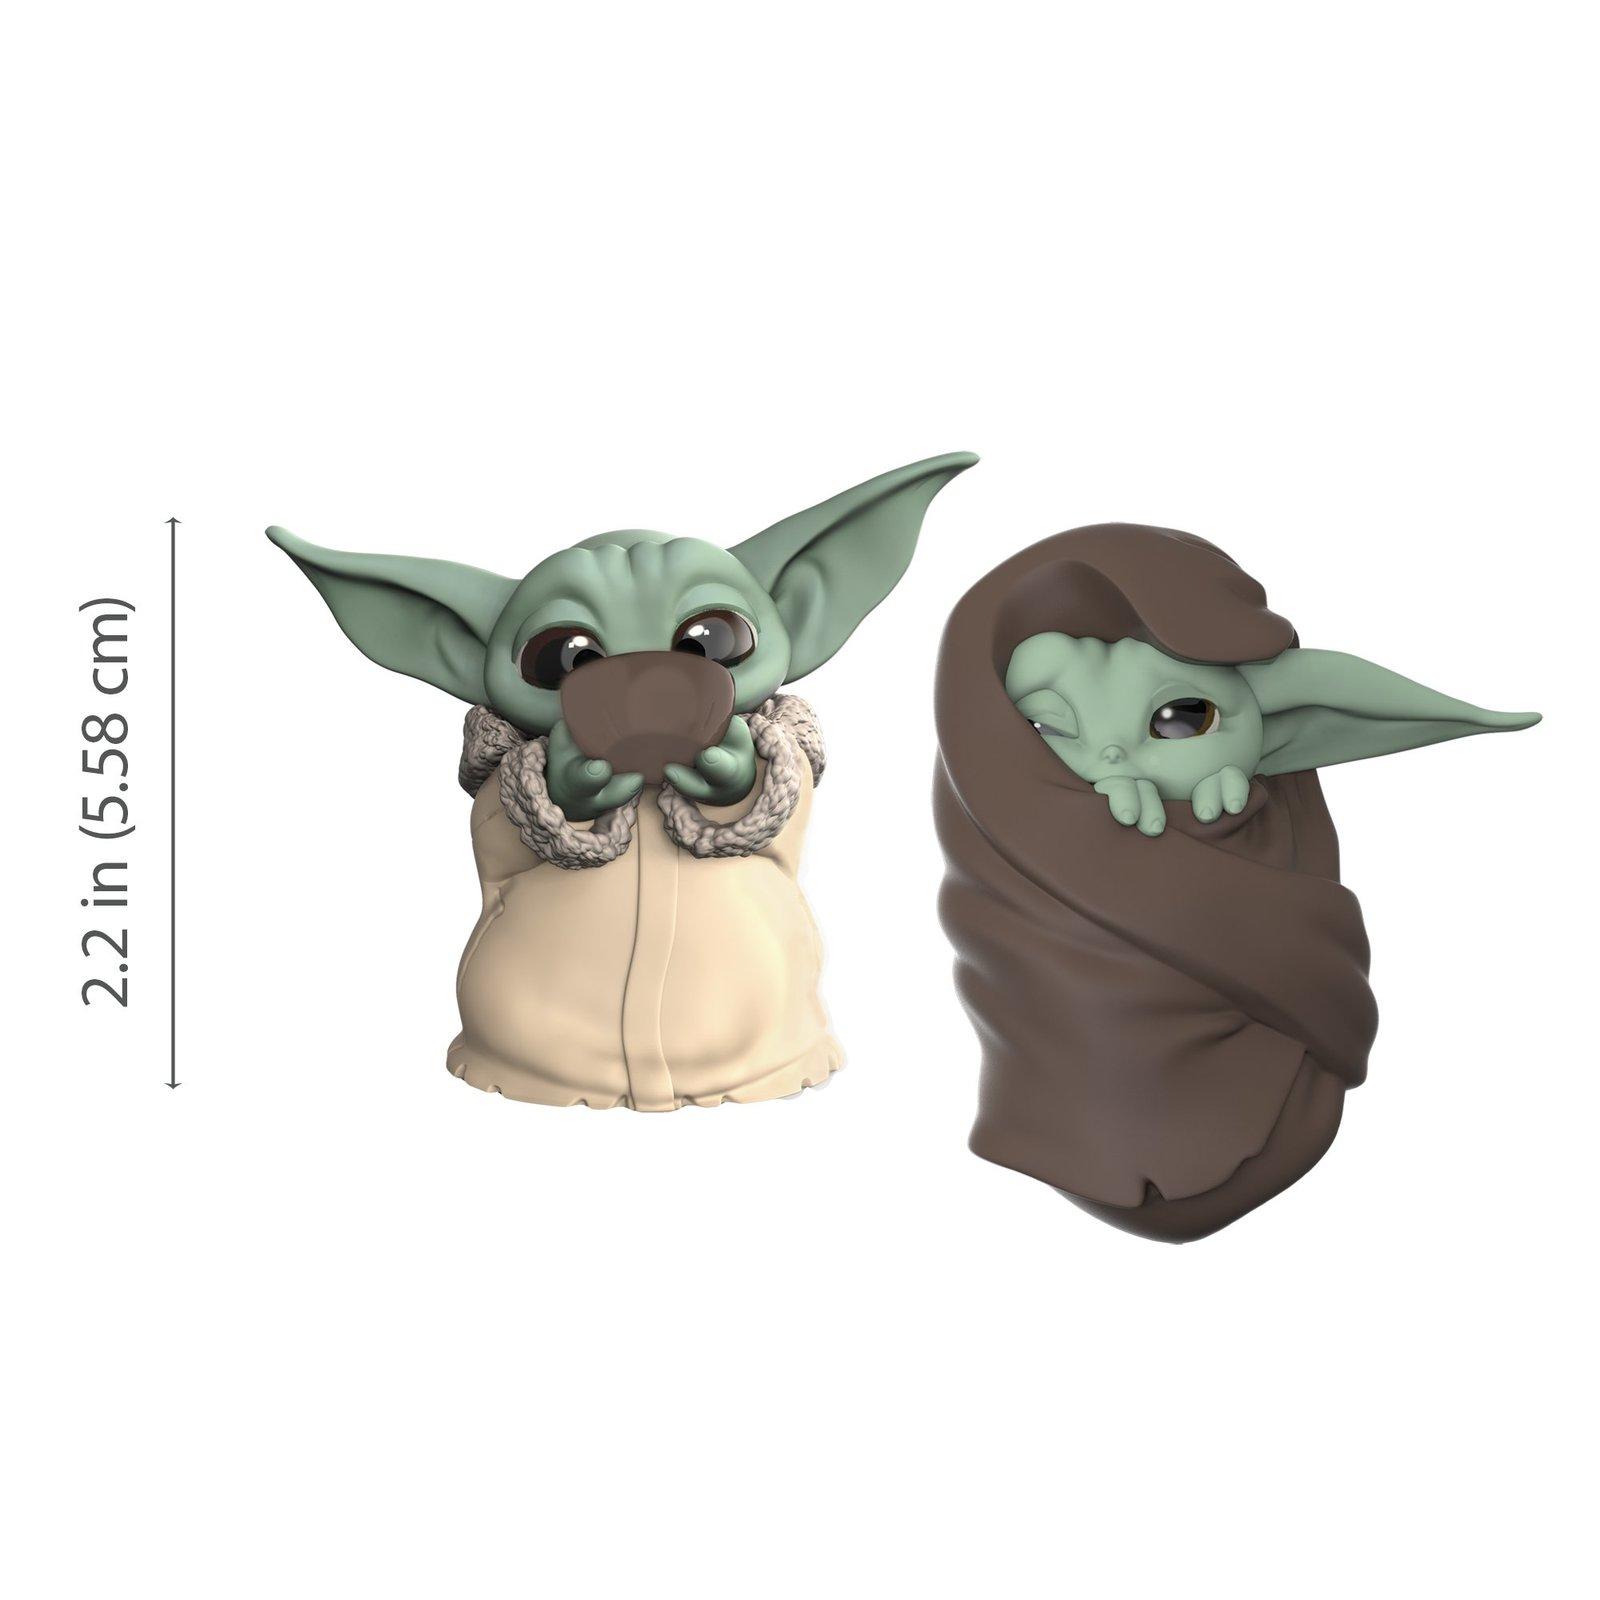 Star Wars: The Child - Soup & Blanket image